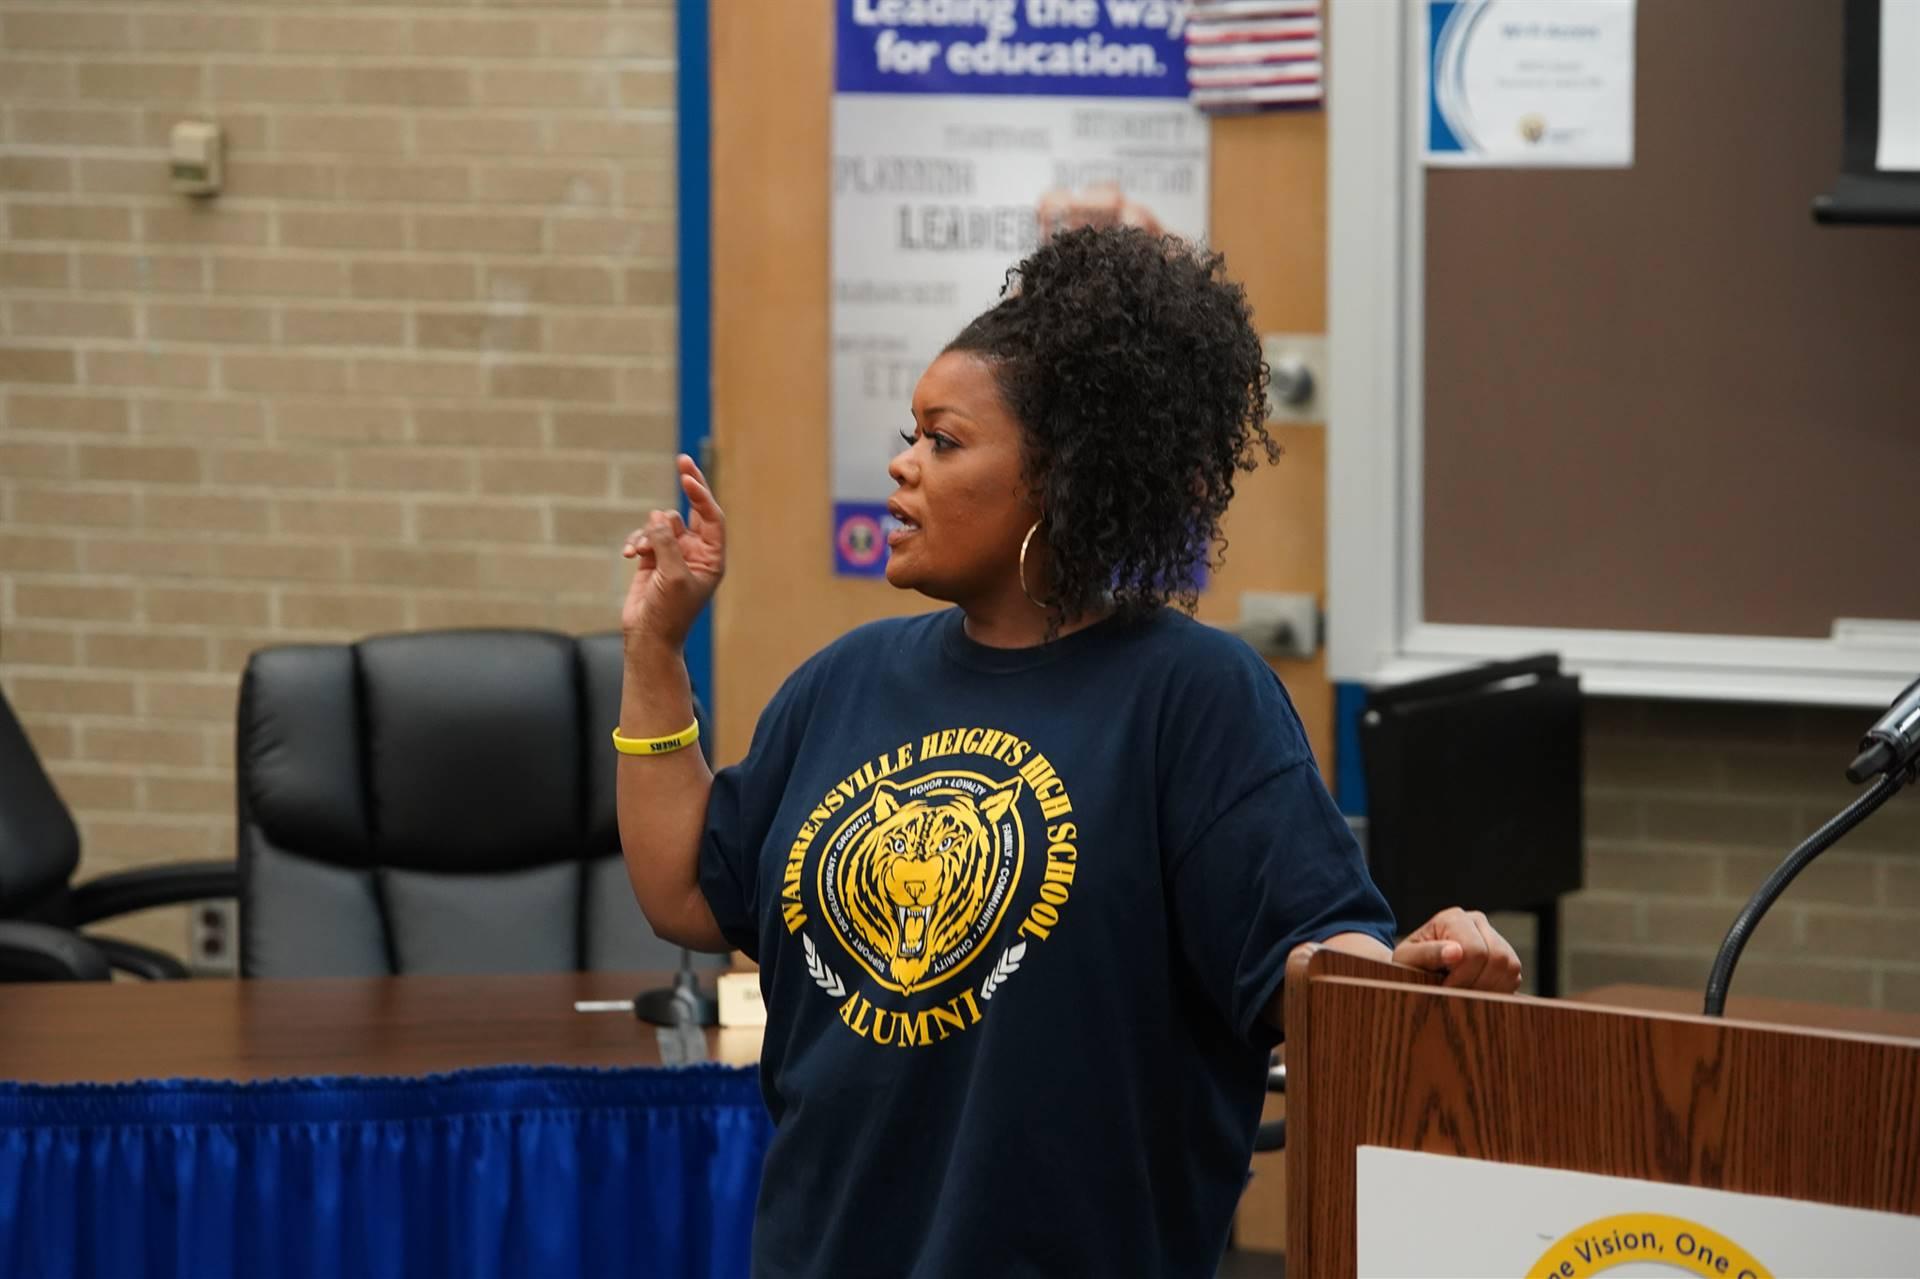 Yvette Nicole Brown visits WHHS